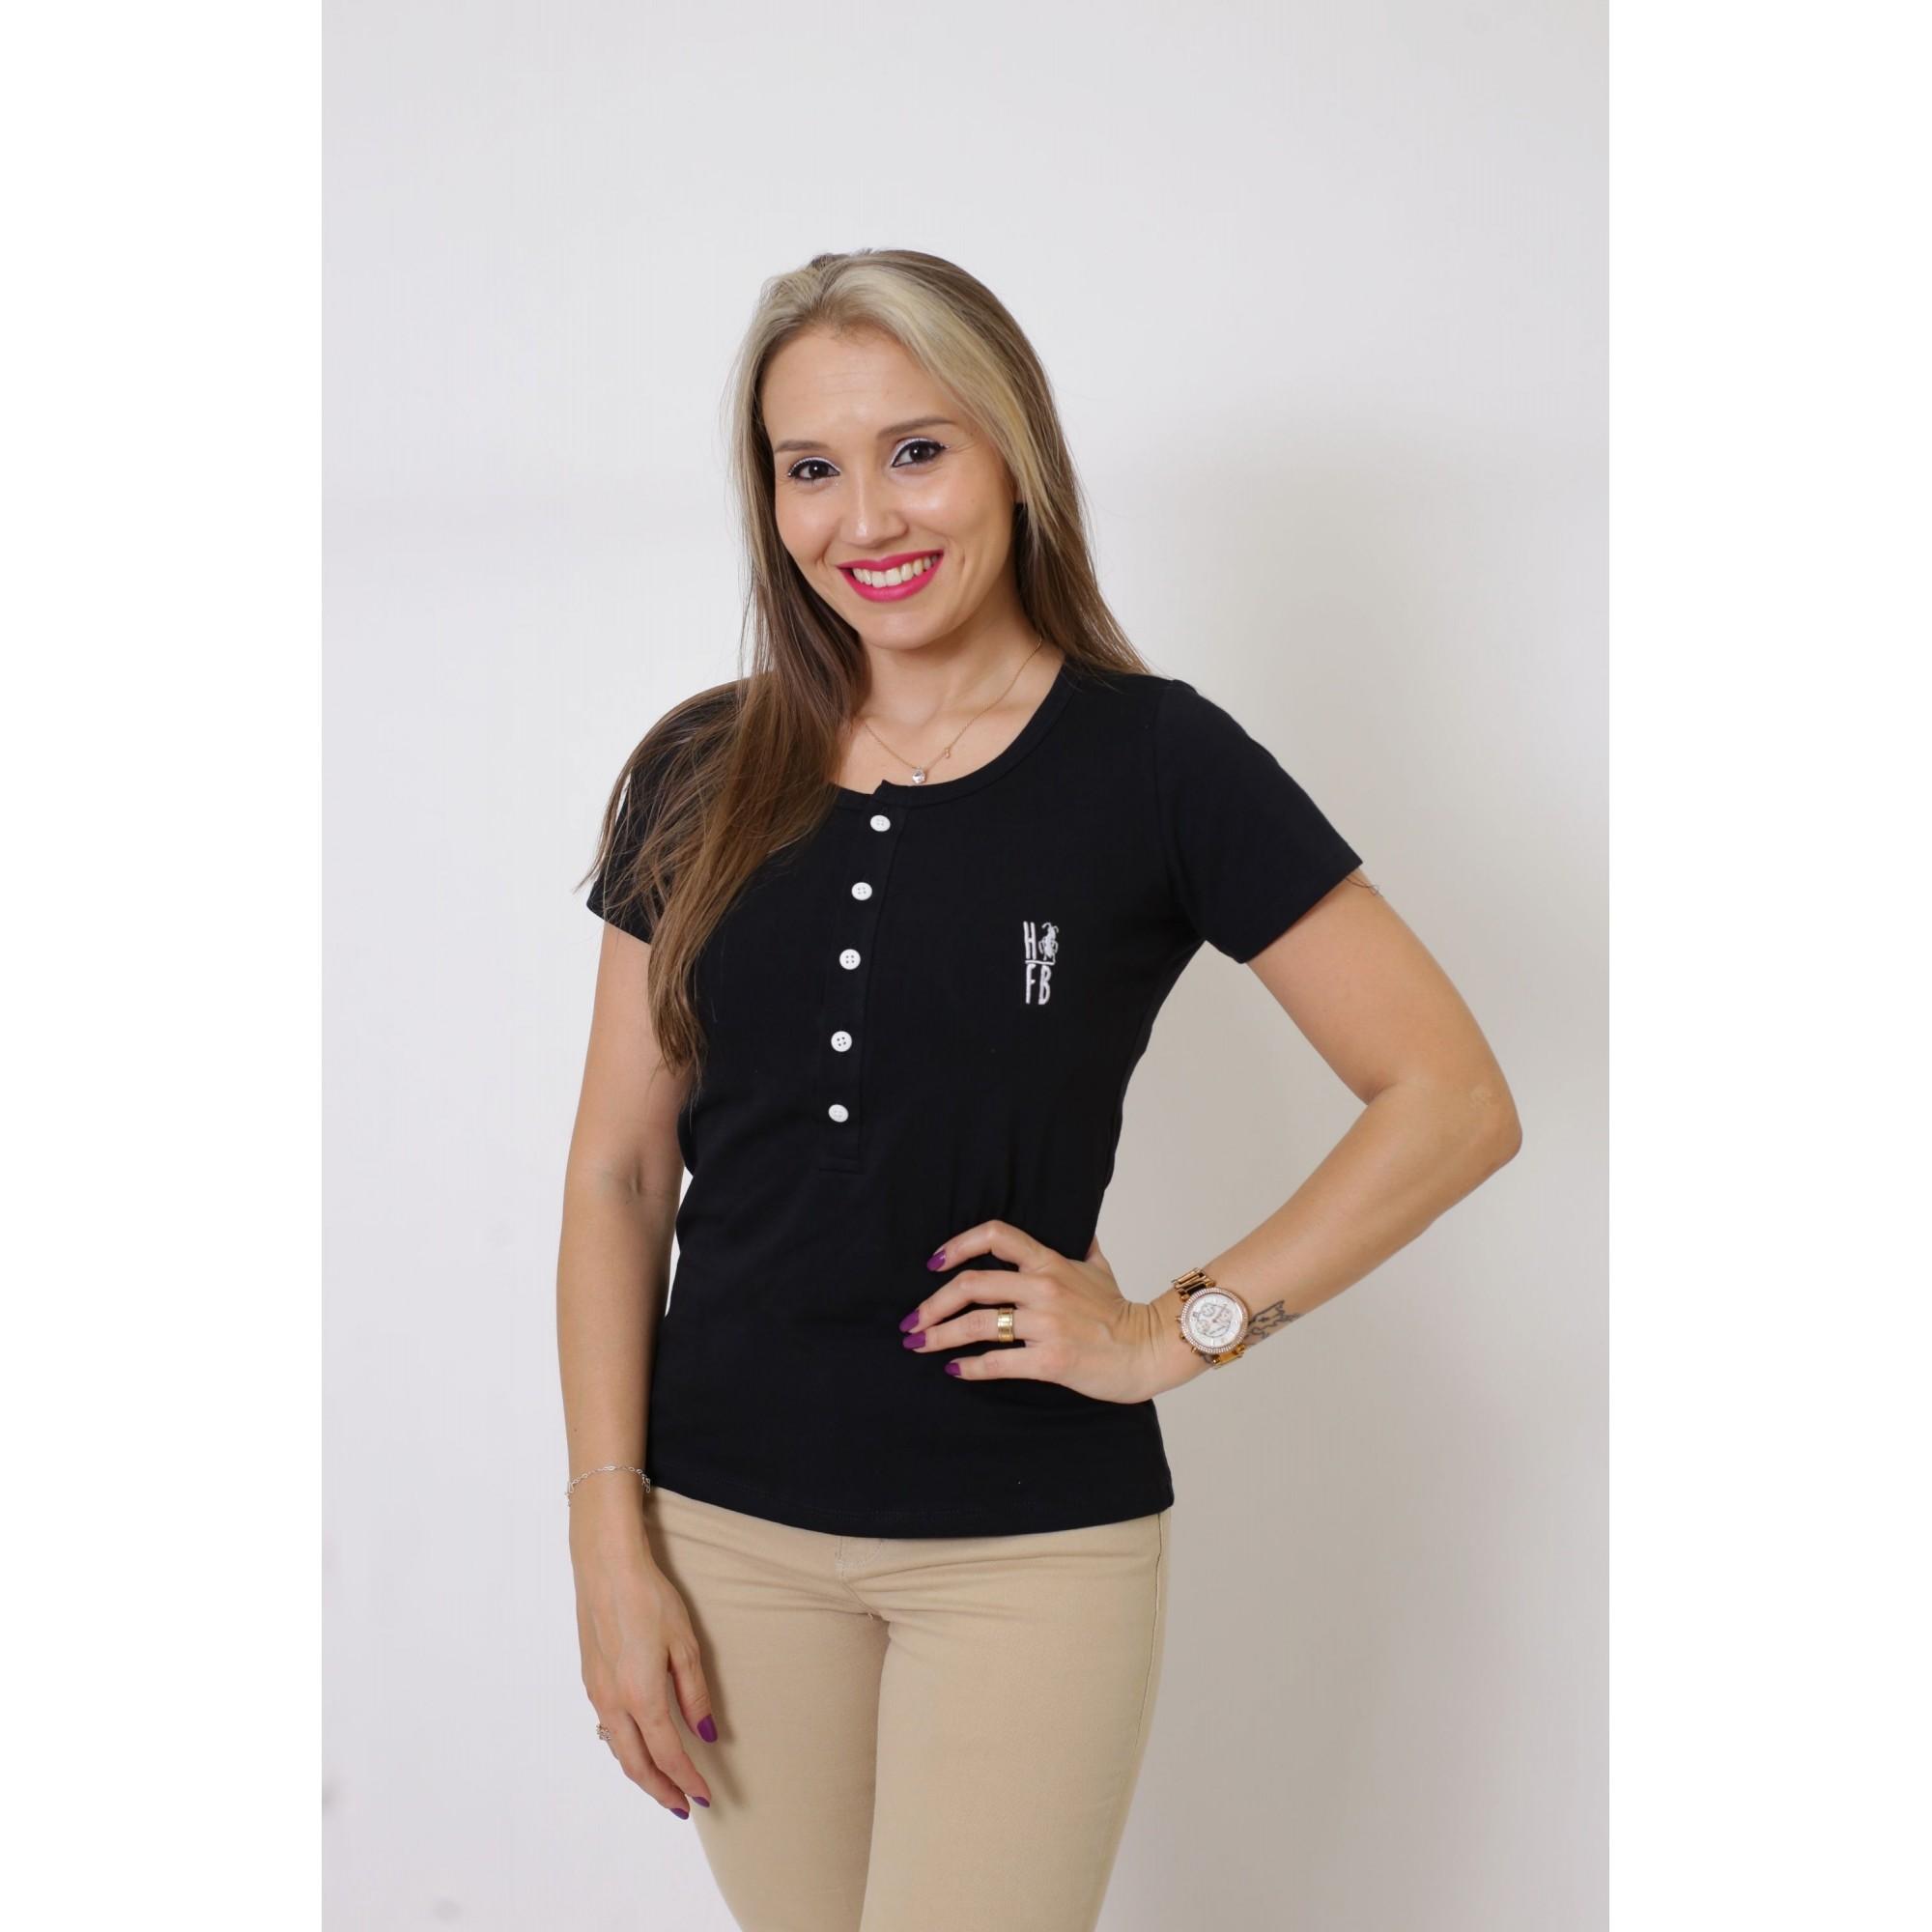 MÃE E FILHA > Kit 02 Peças - T-Shirts ou Body Henley - Preto [Coleção Tal Mãe Tal Filha]  - Heitor Fashion Brazil